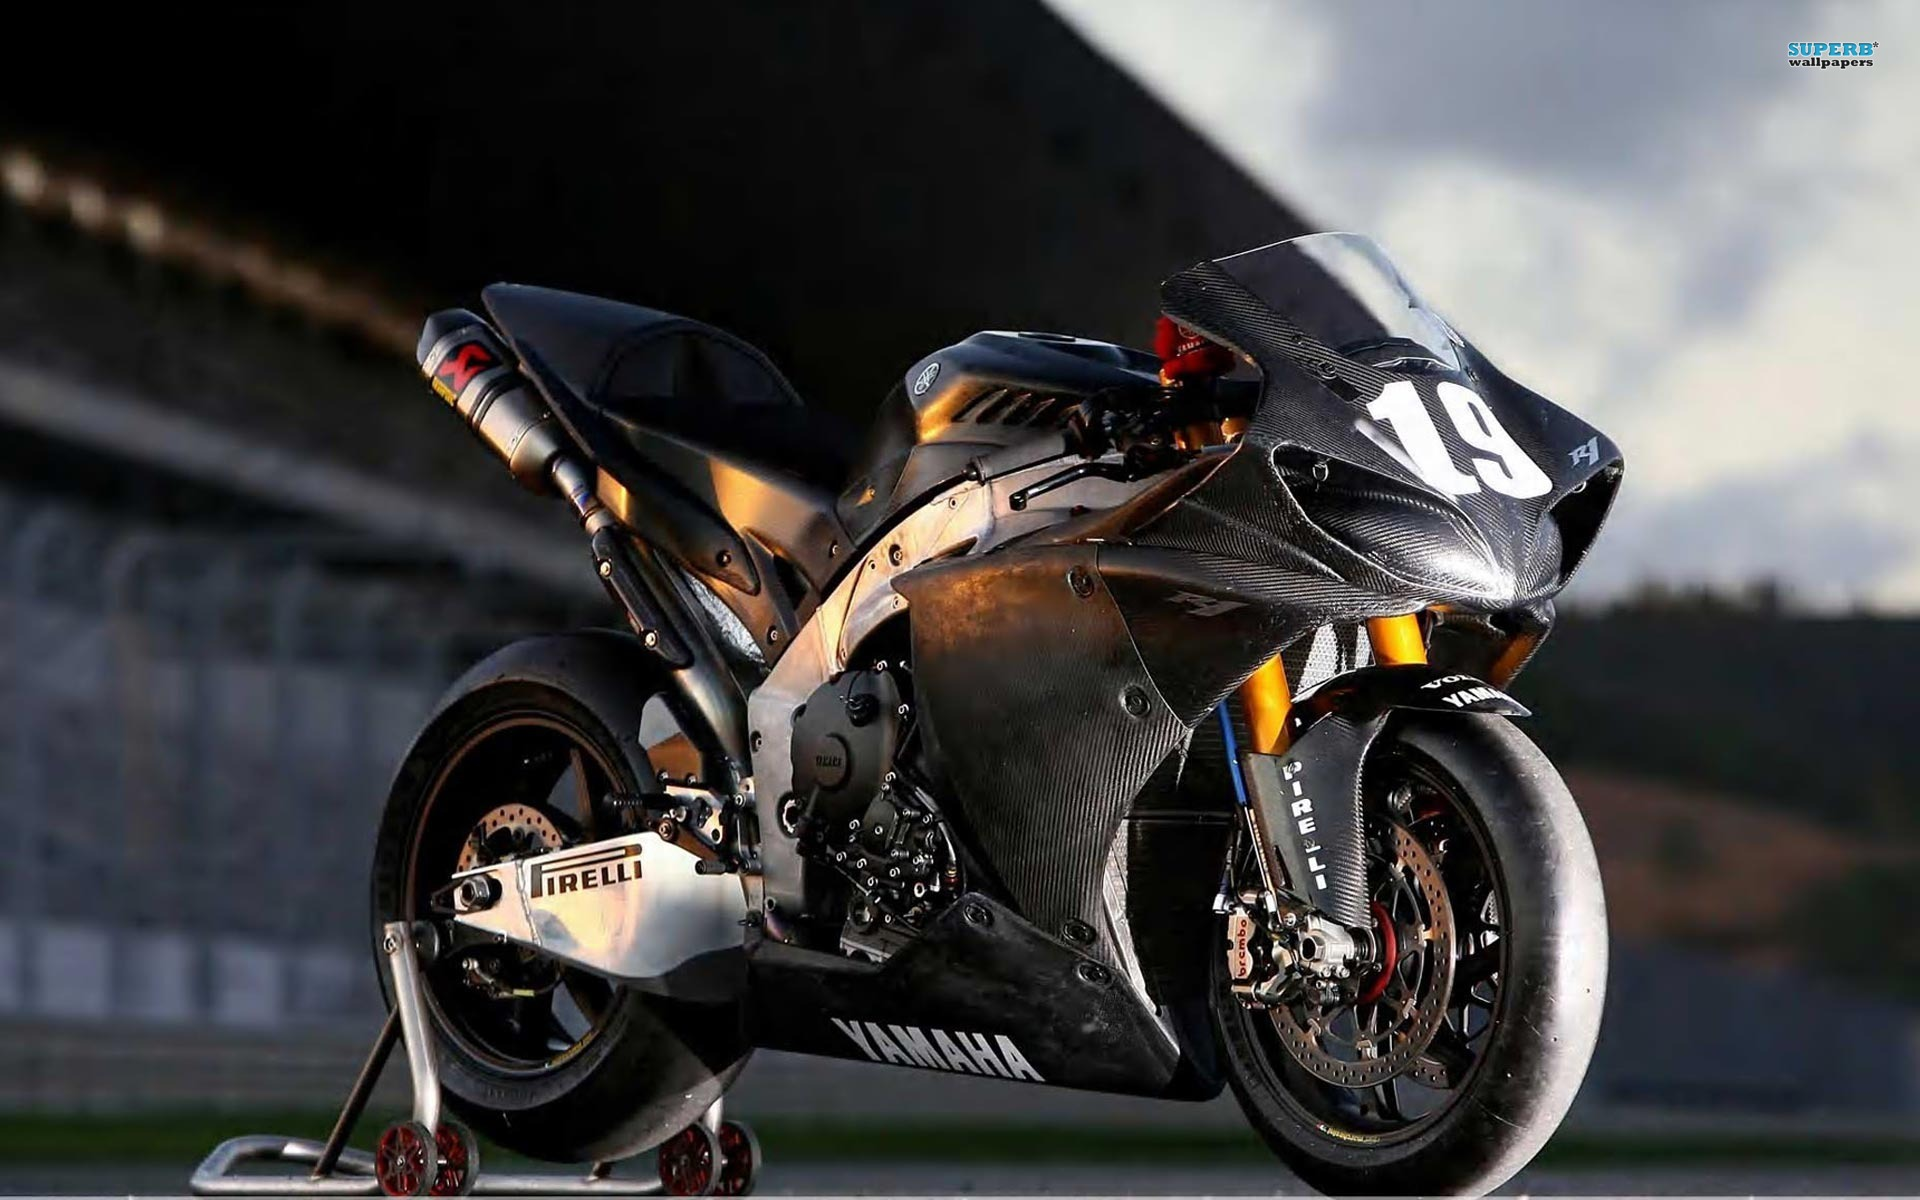 Photo Moto Yamaha Motard Wallpaper Fond Ecran Hd